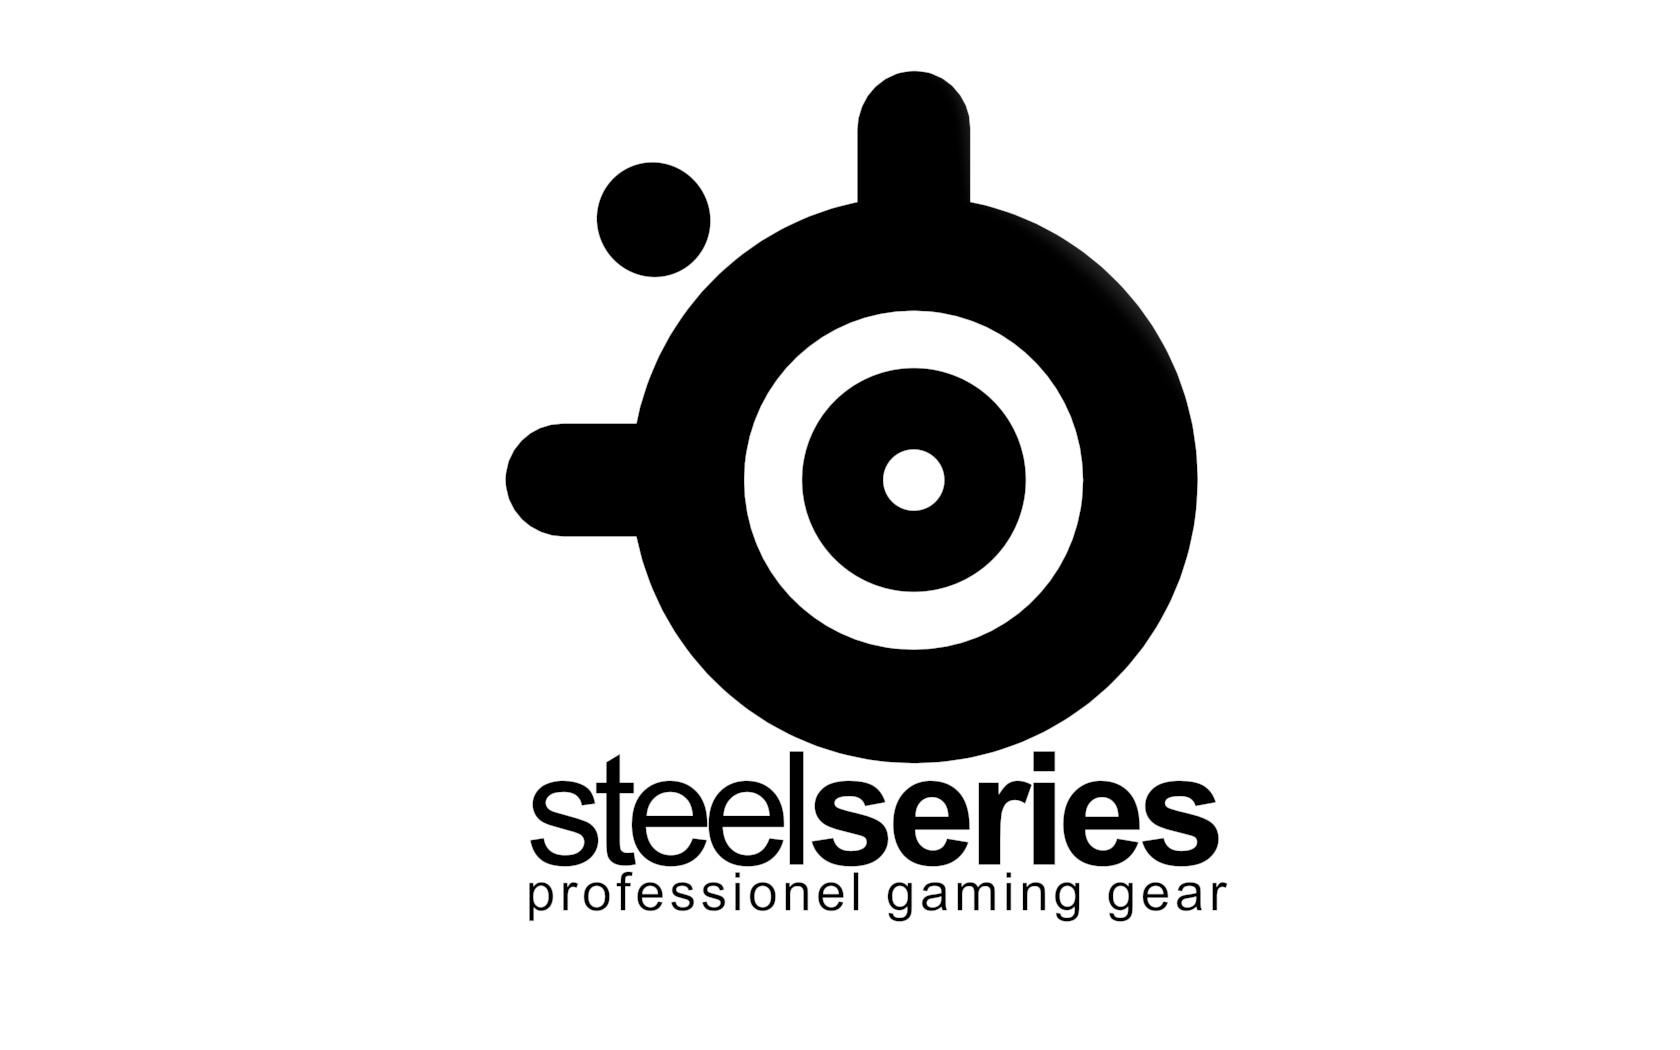 15% Discount alles van SteelSeries